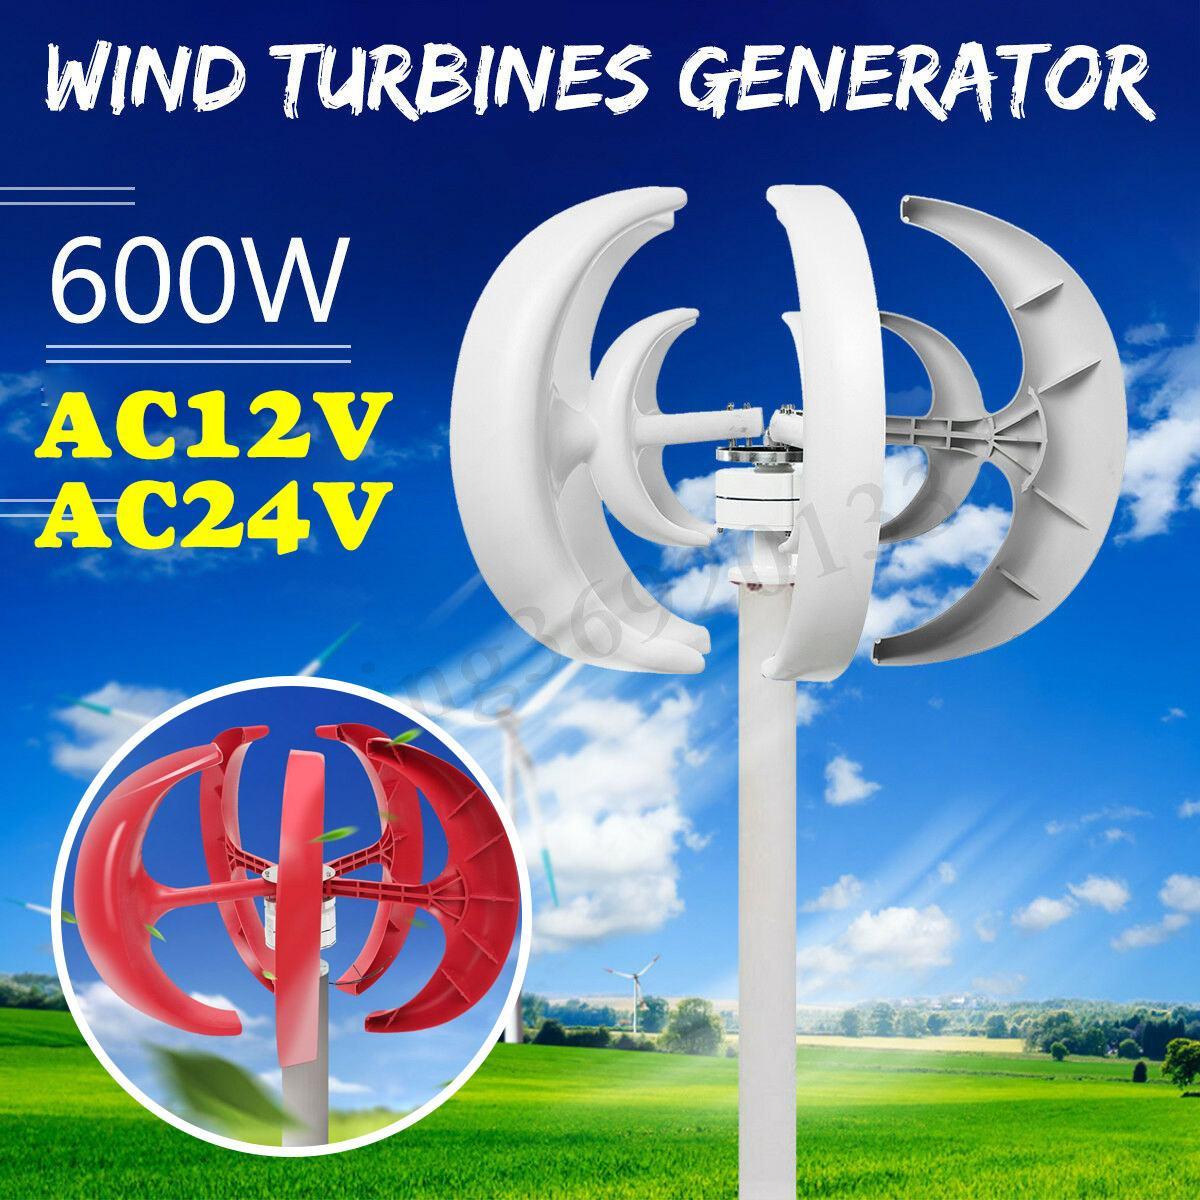 Max 600W 12V 24V VAWT 5 Blades Vertical Axis Wind Turbines Generator  Lantern Type-in Alternative Energy Generators from Home Improvement on AliExpress